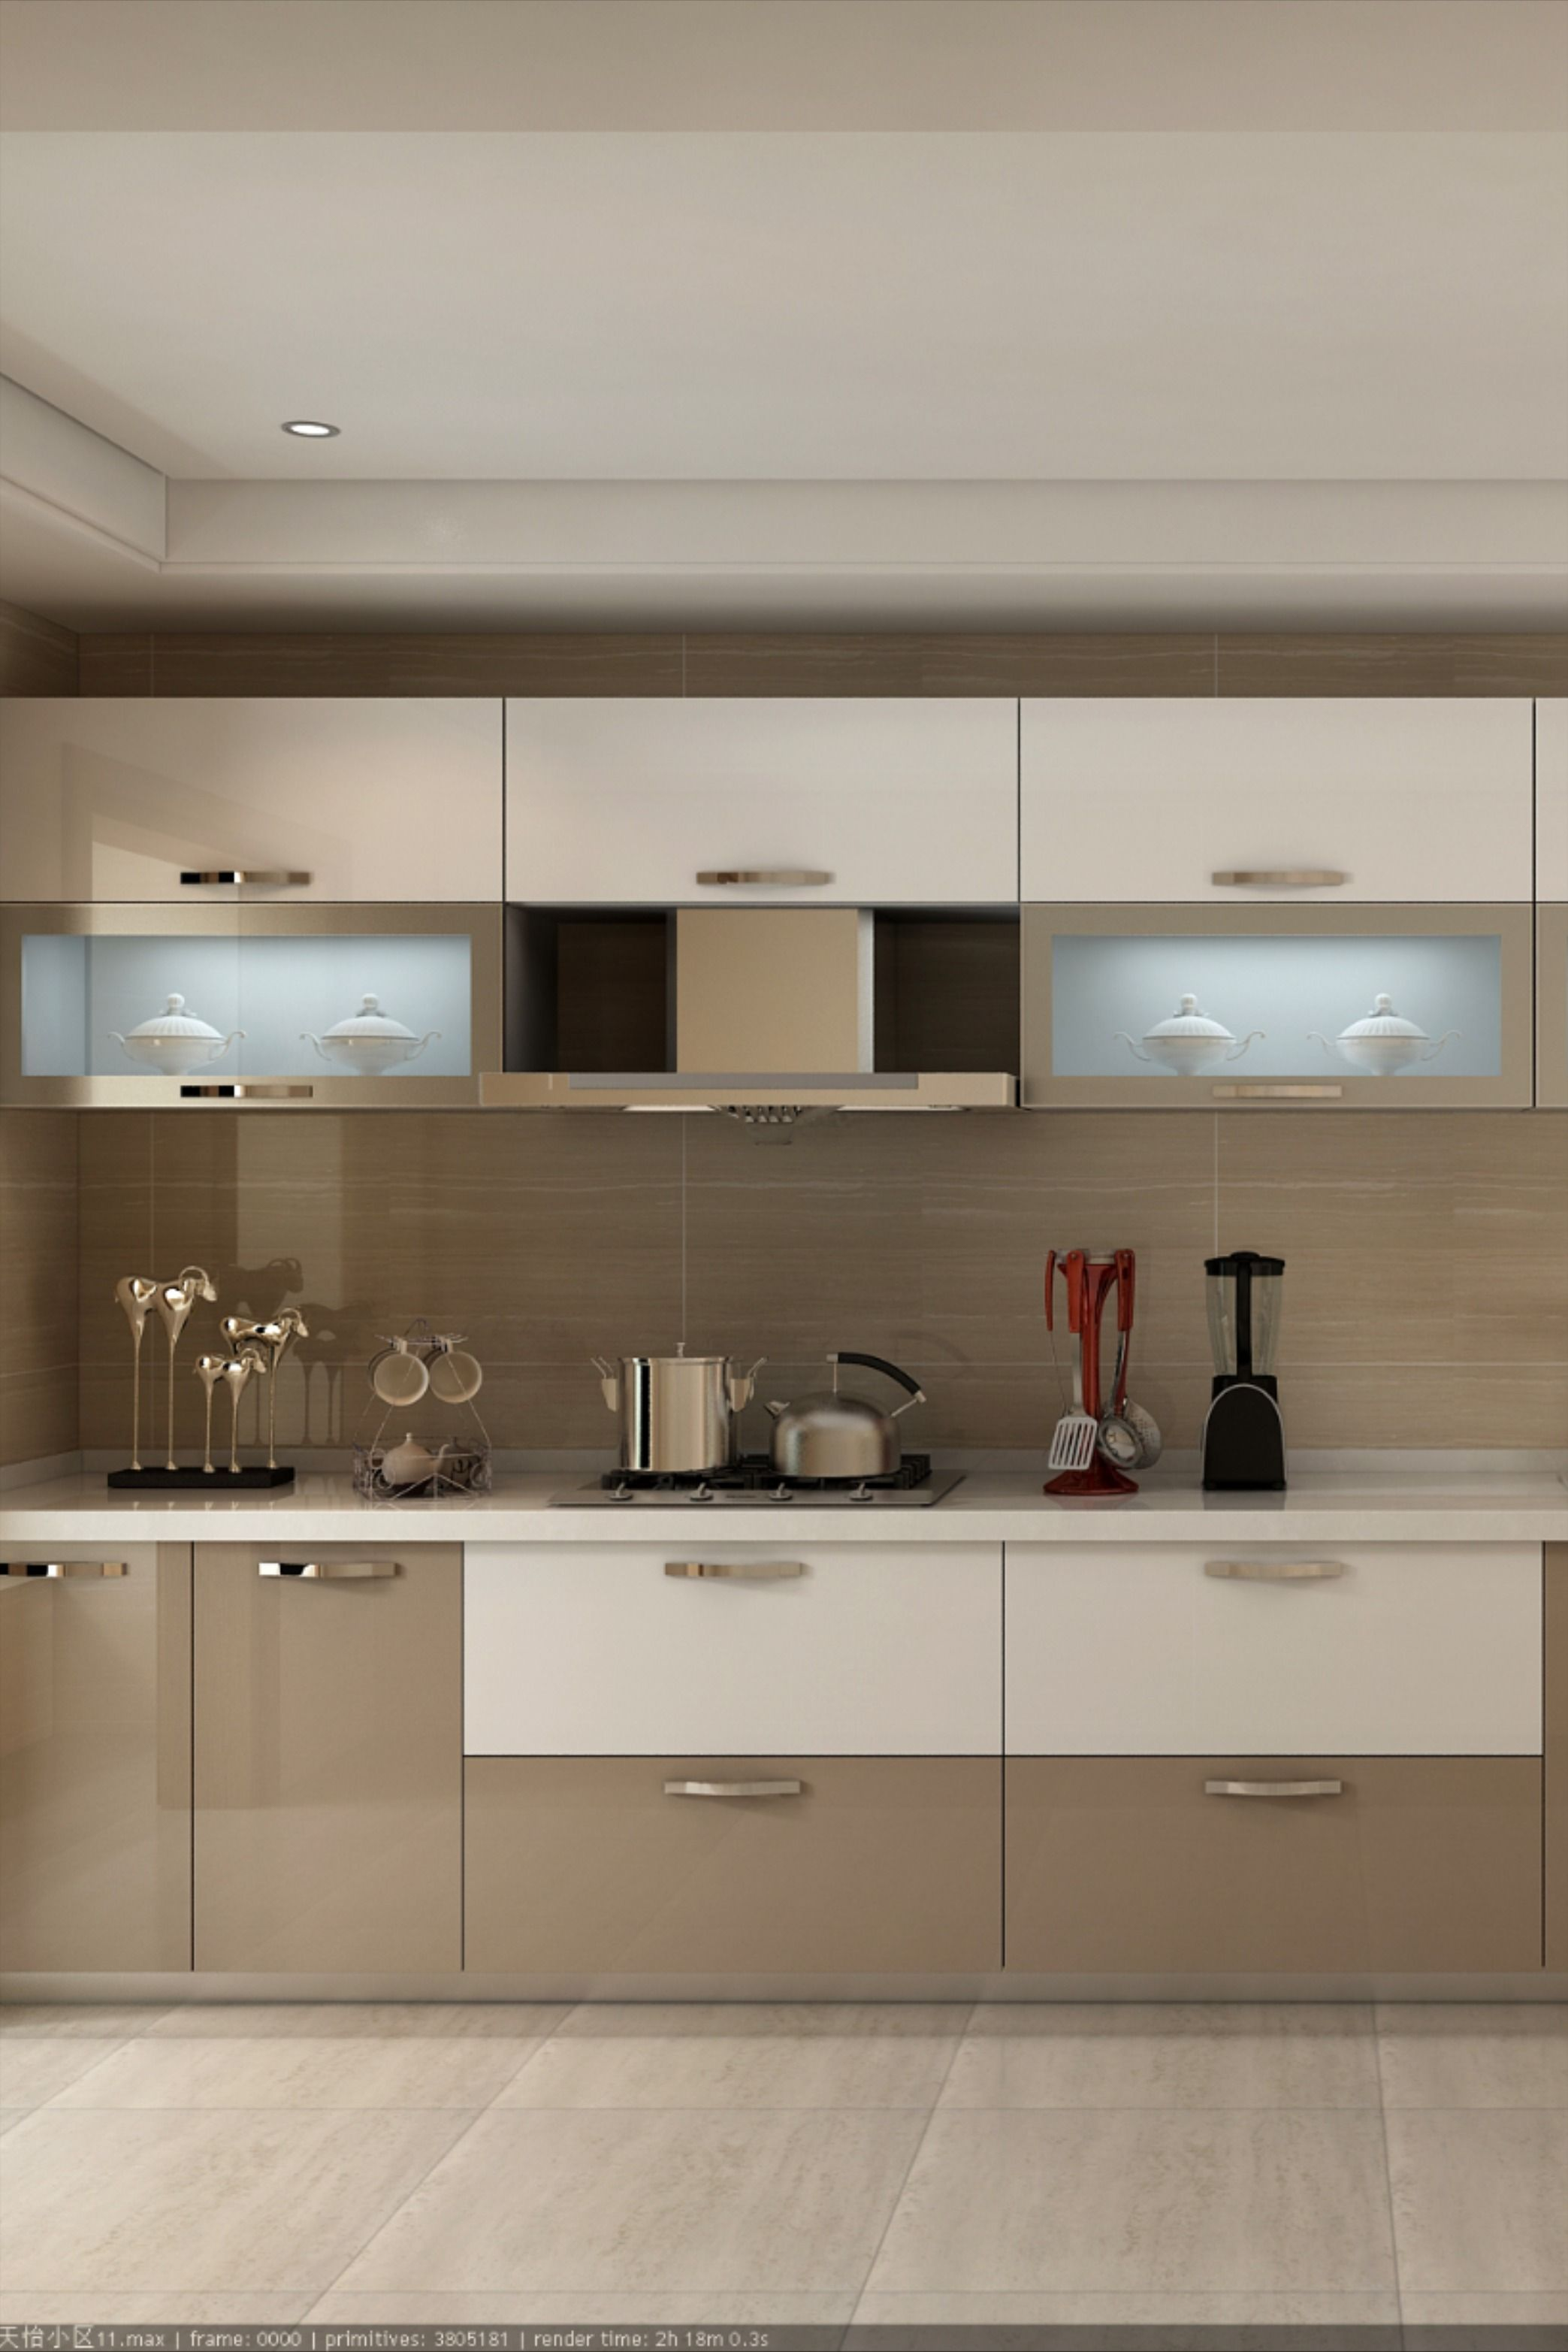 High Gloss Grey Acrylic Kitchen Cabinet Modern Www Nywoodwork Com Kitchencabinets Idea Kitchen Inspirations Kitchen Renovation High Gloss Kitchen Cabinets